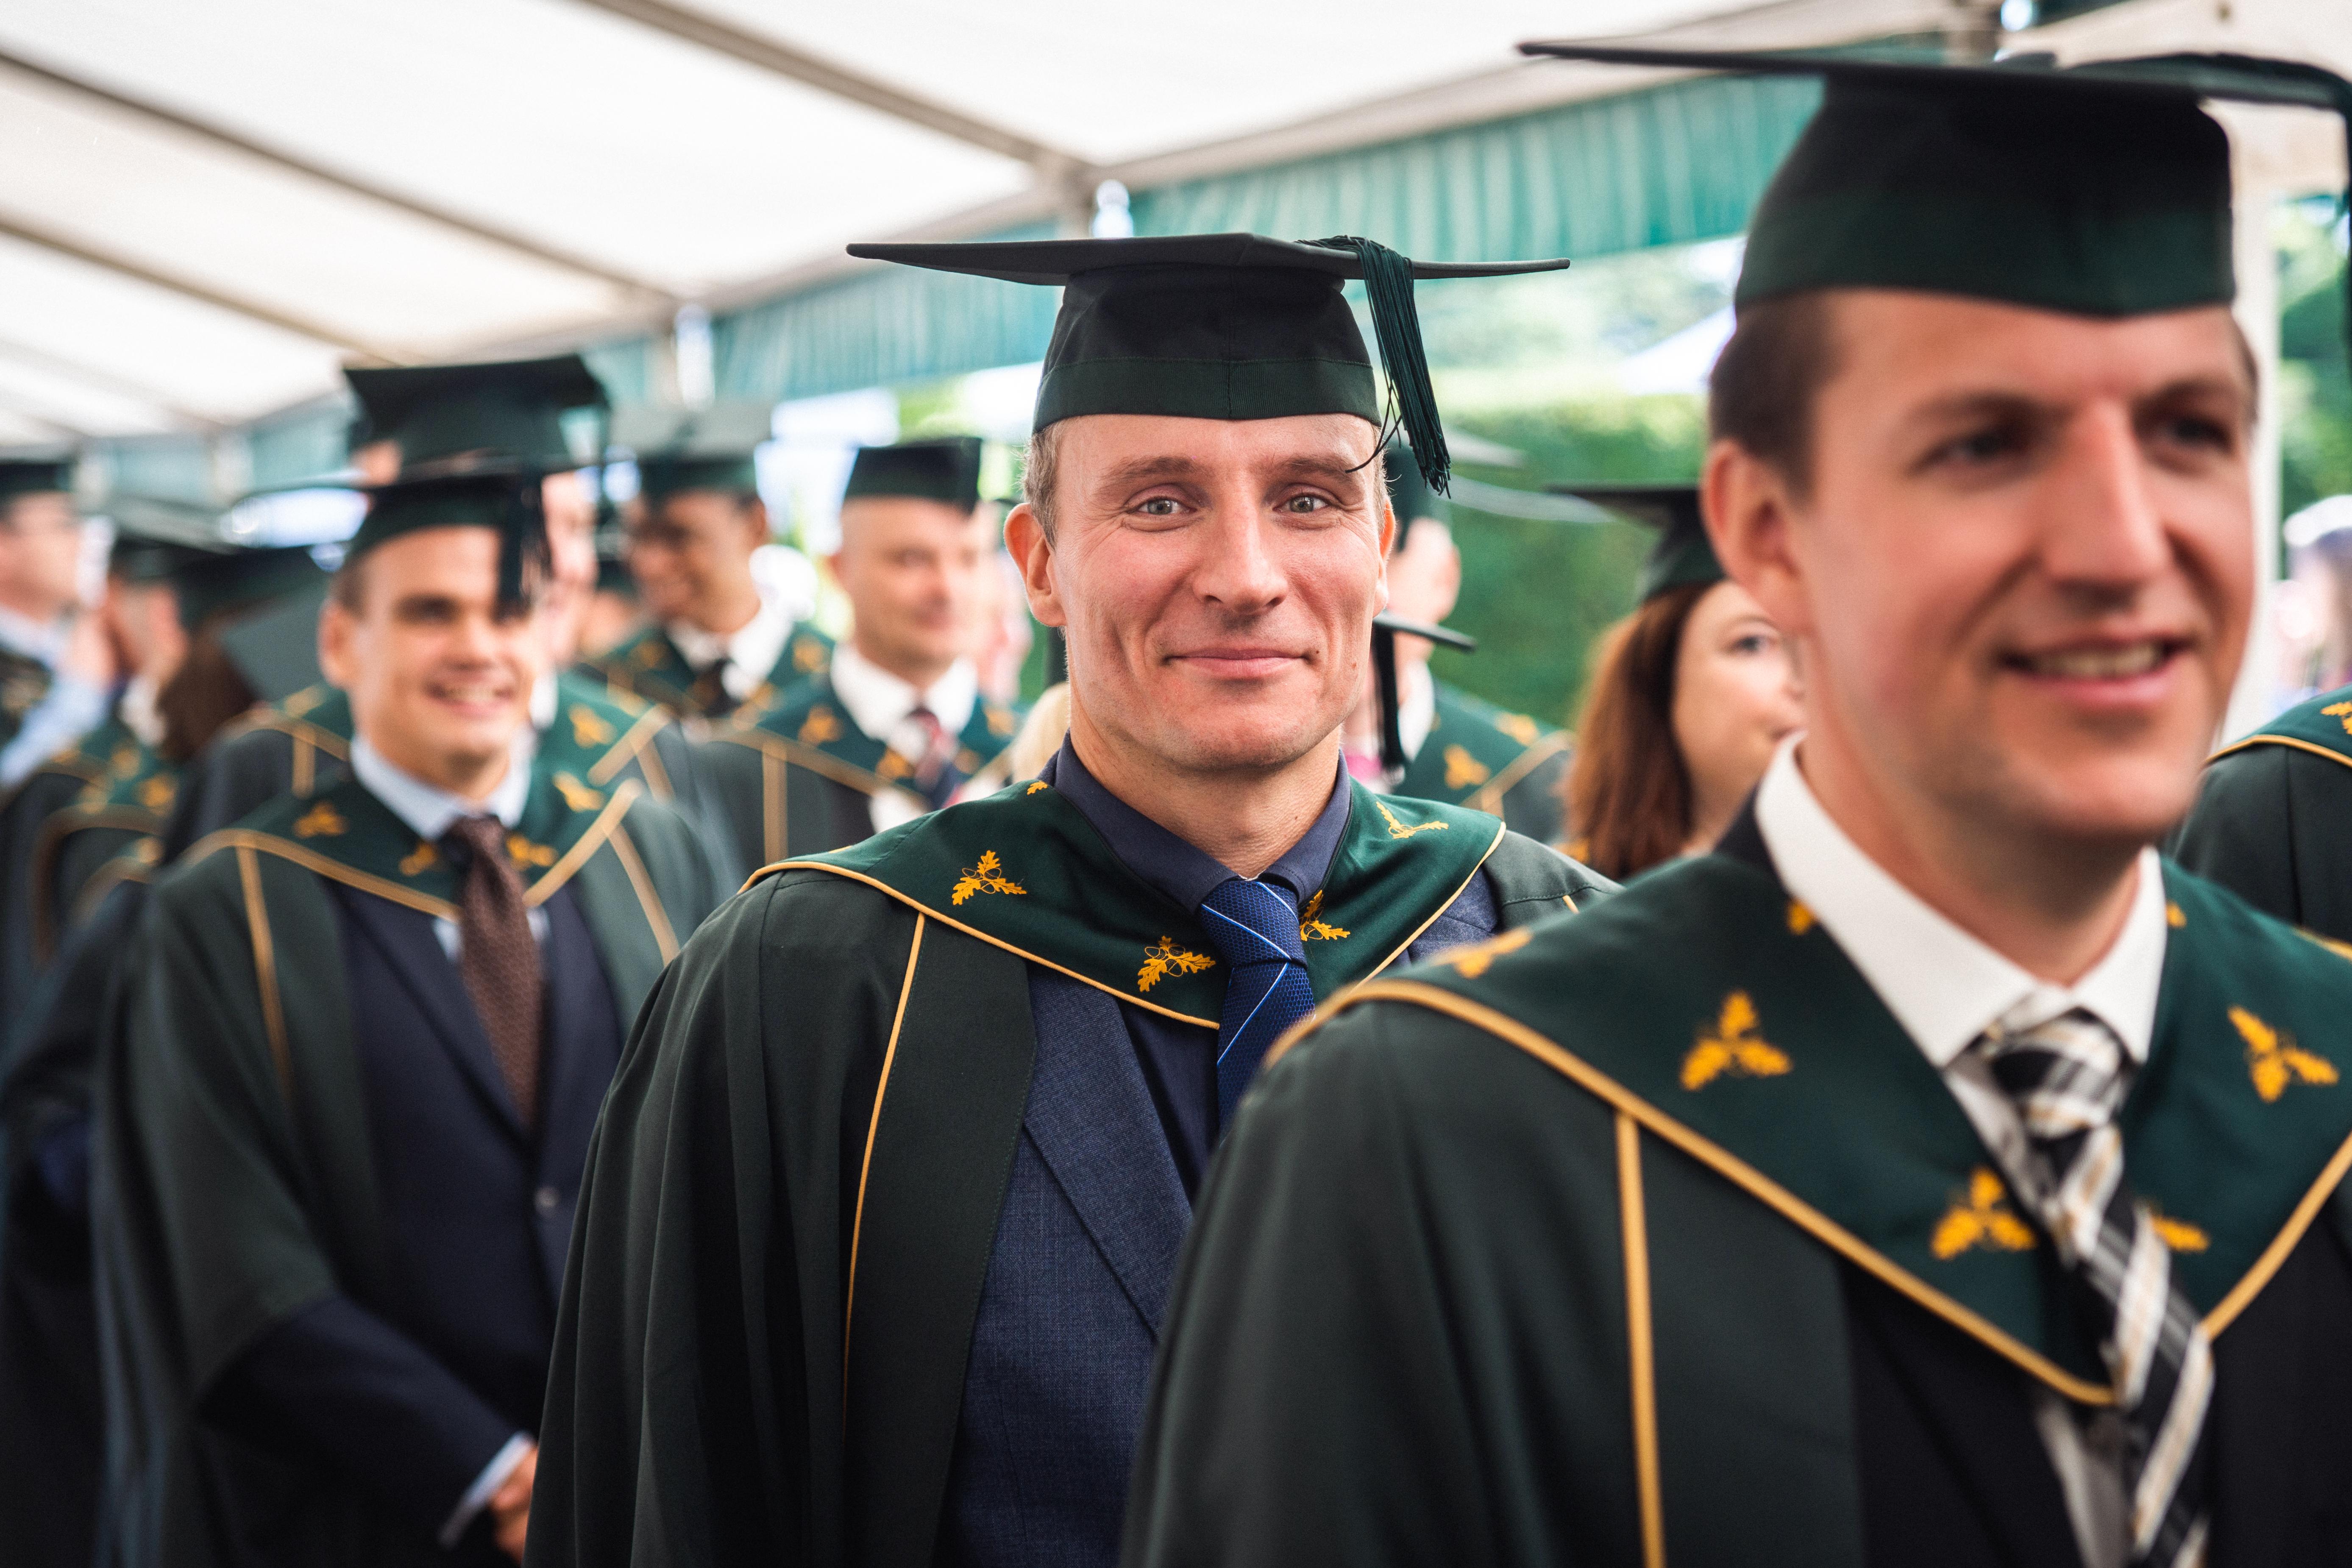 Greenlands Graduation 2019